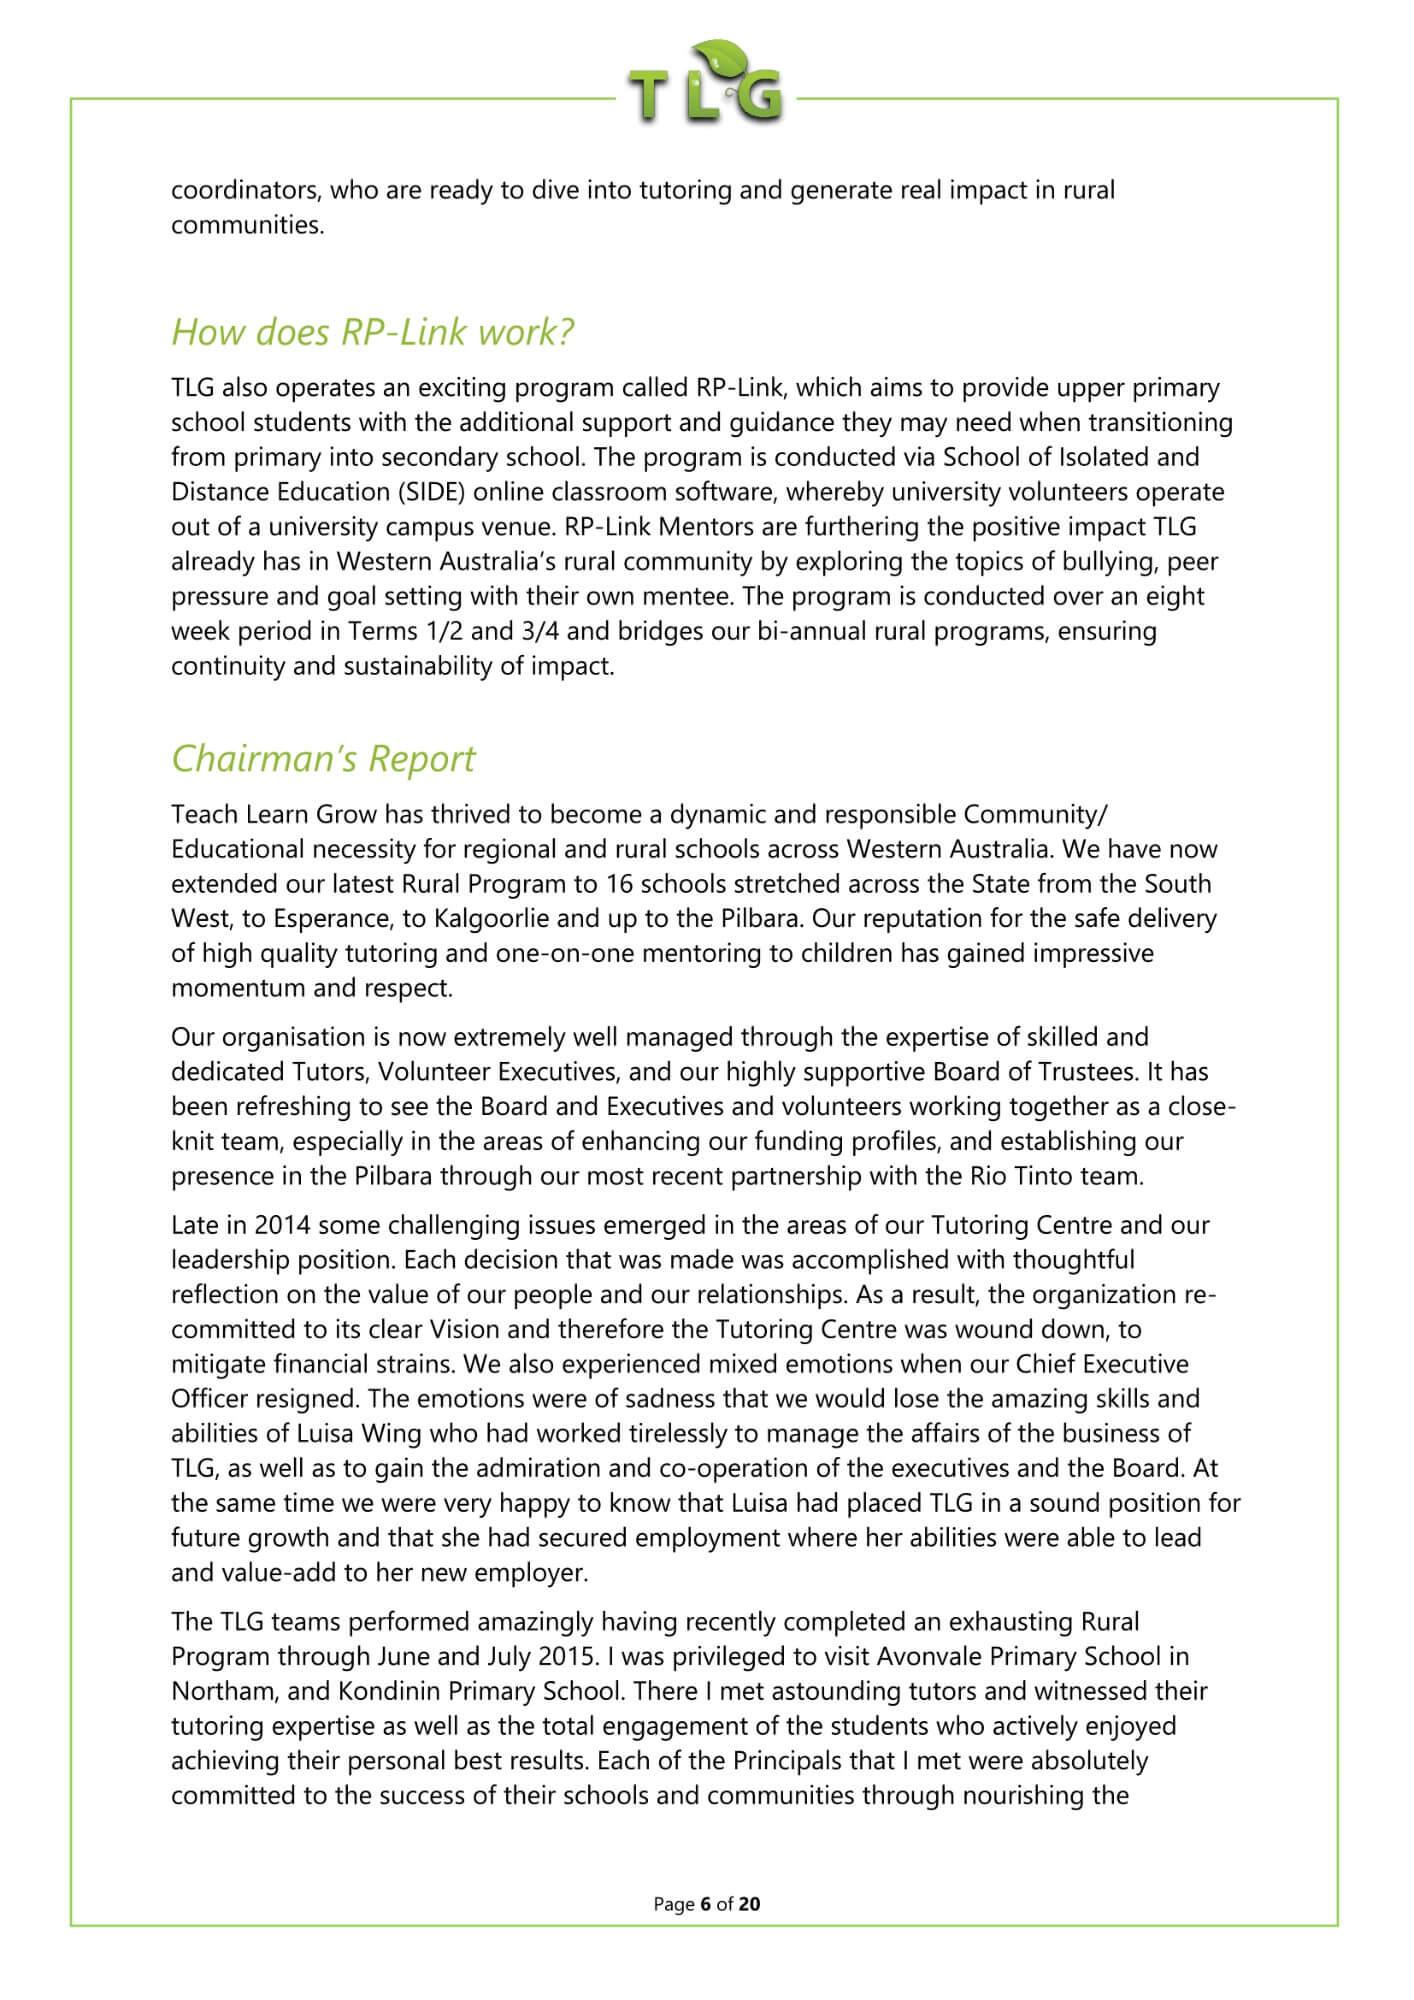 tlg-annual-report-FY14-06.jpg